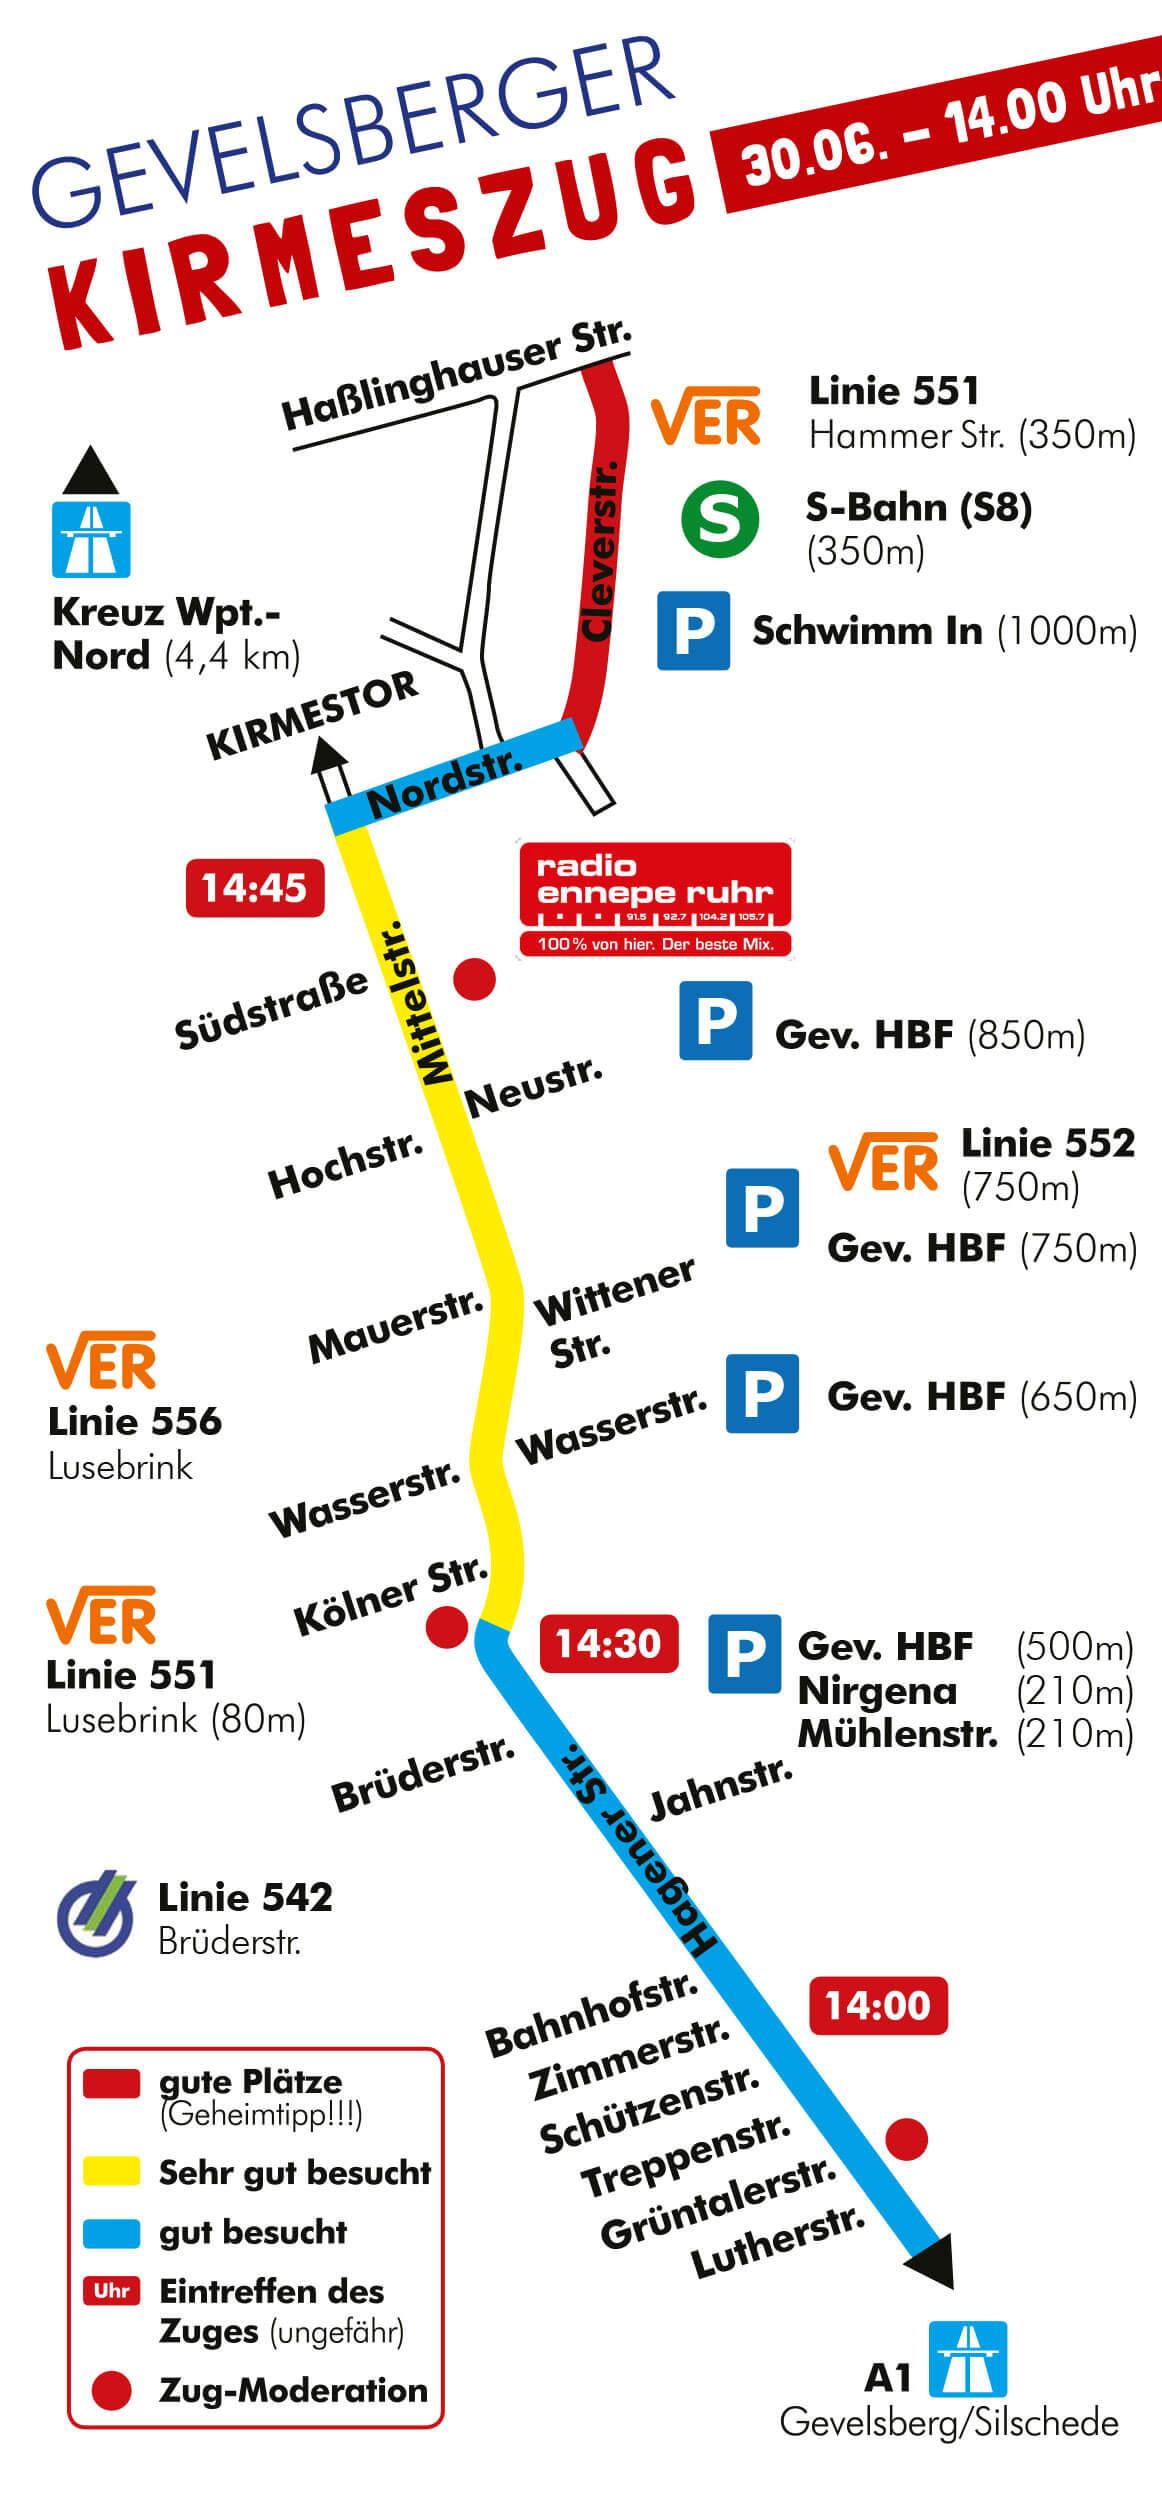 Zugverlauf des Gevelsberger Kirmeszuges 2019